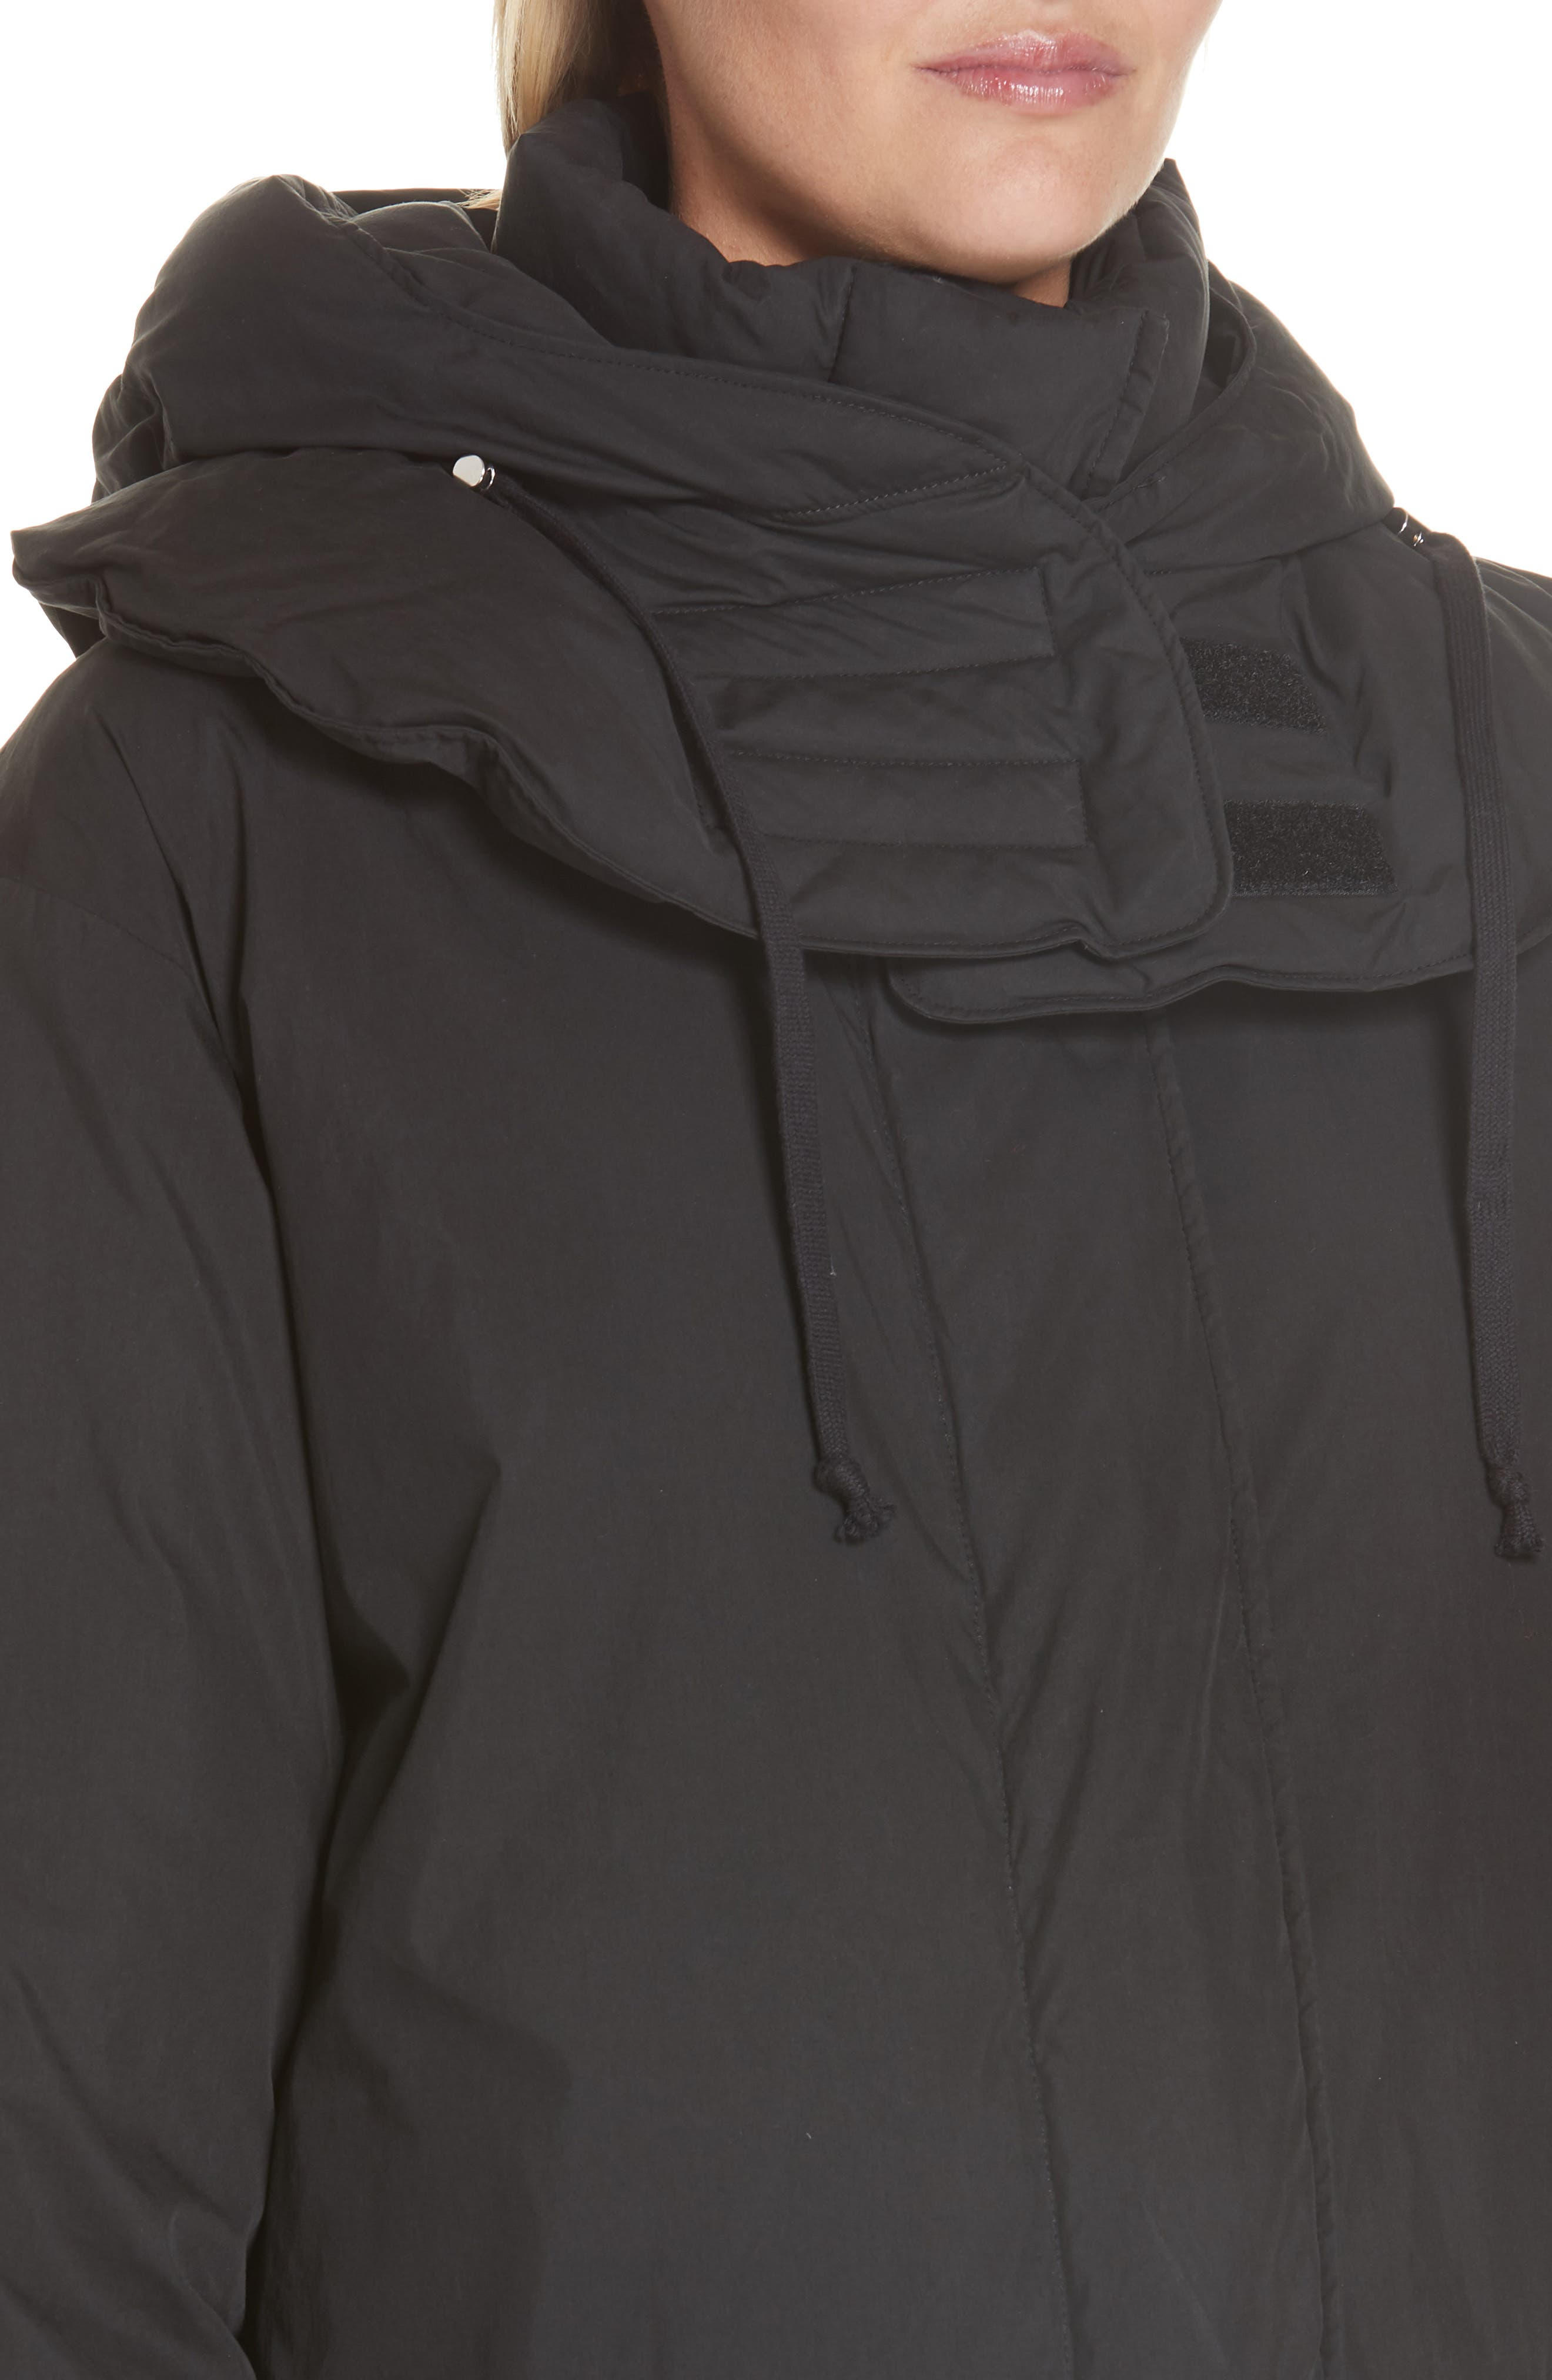 HELMUT LANG, Removable Hood Puffer Jacket, Alternate thumbnail 6, color, 001